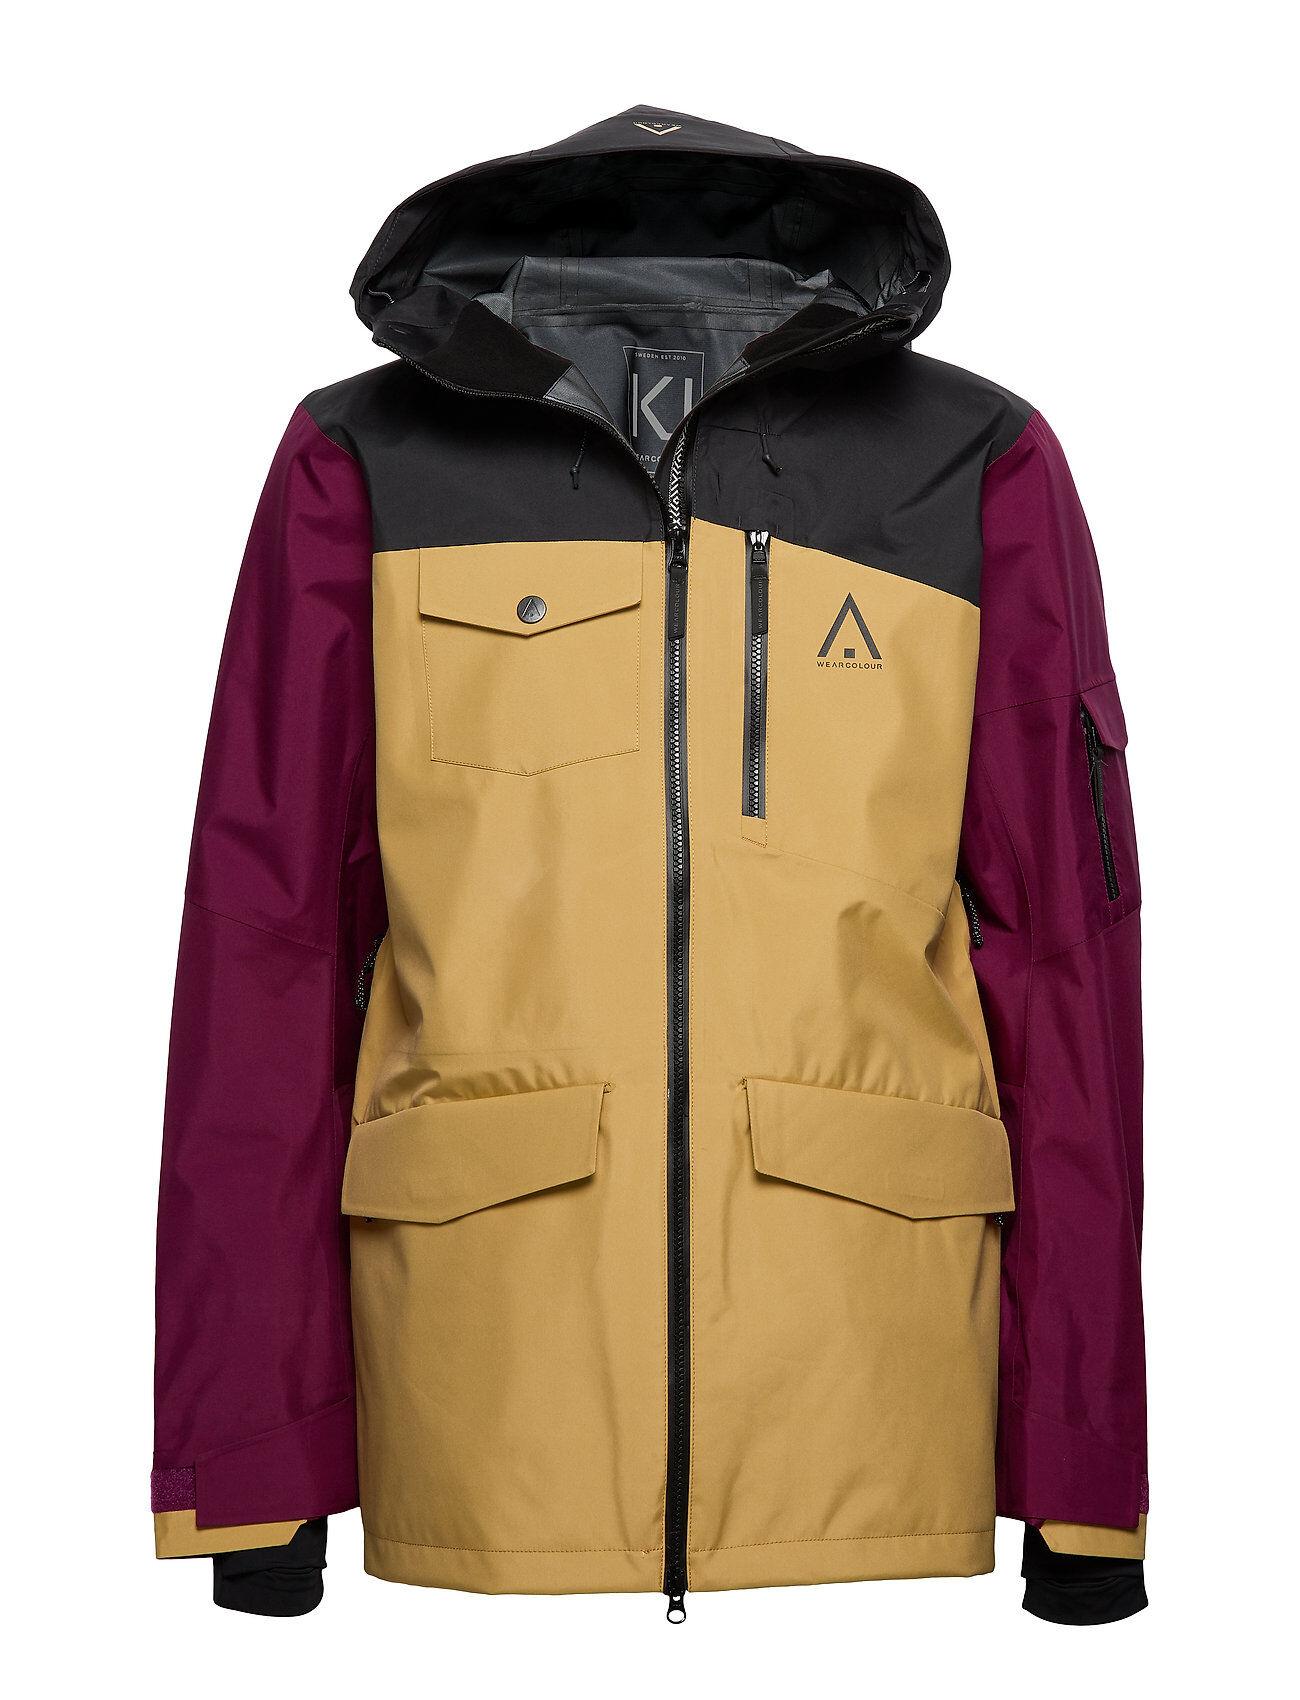 WearColour Hawk Jacket Outerwear Sport Jackets Monivärinen/Kuvioitu WearColour